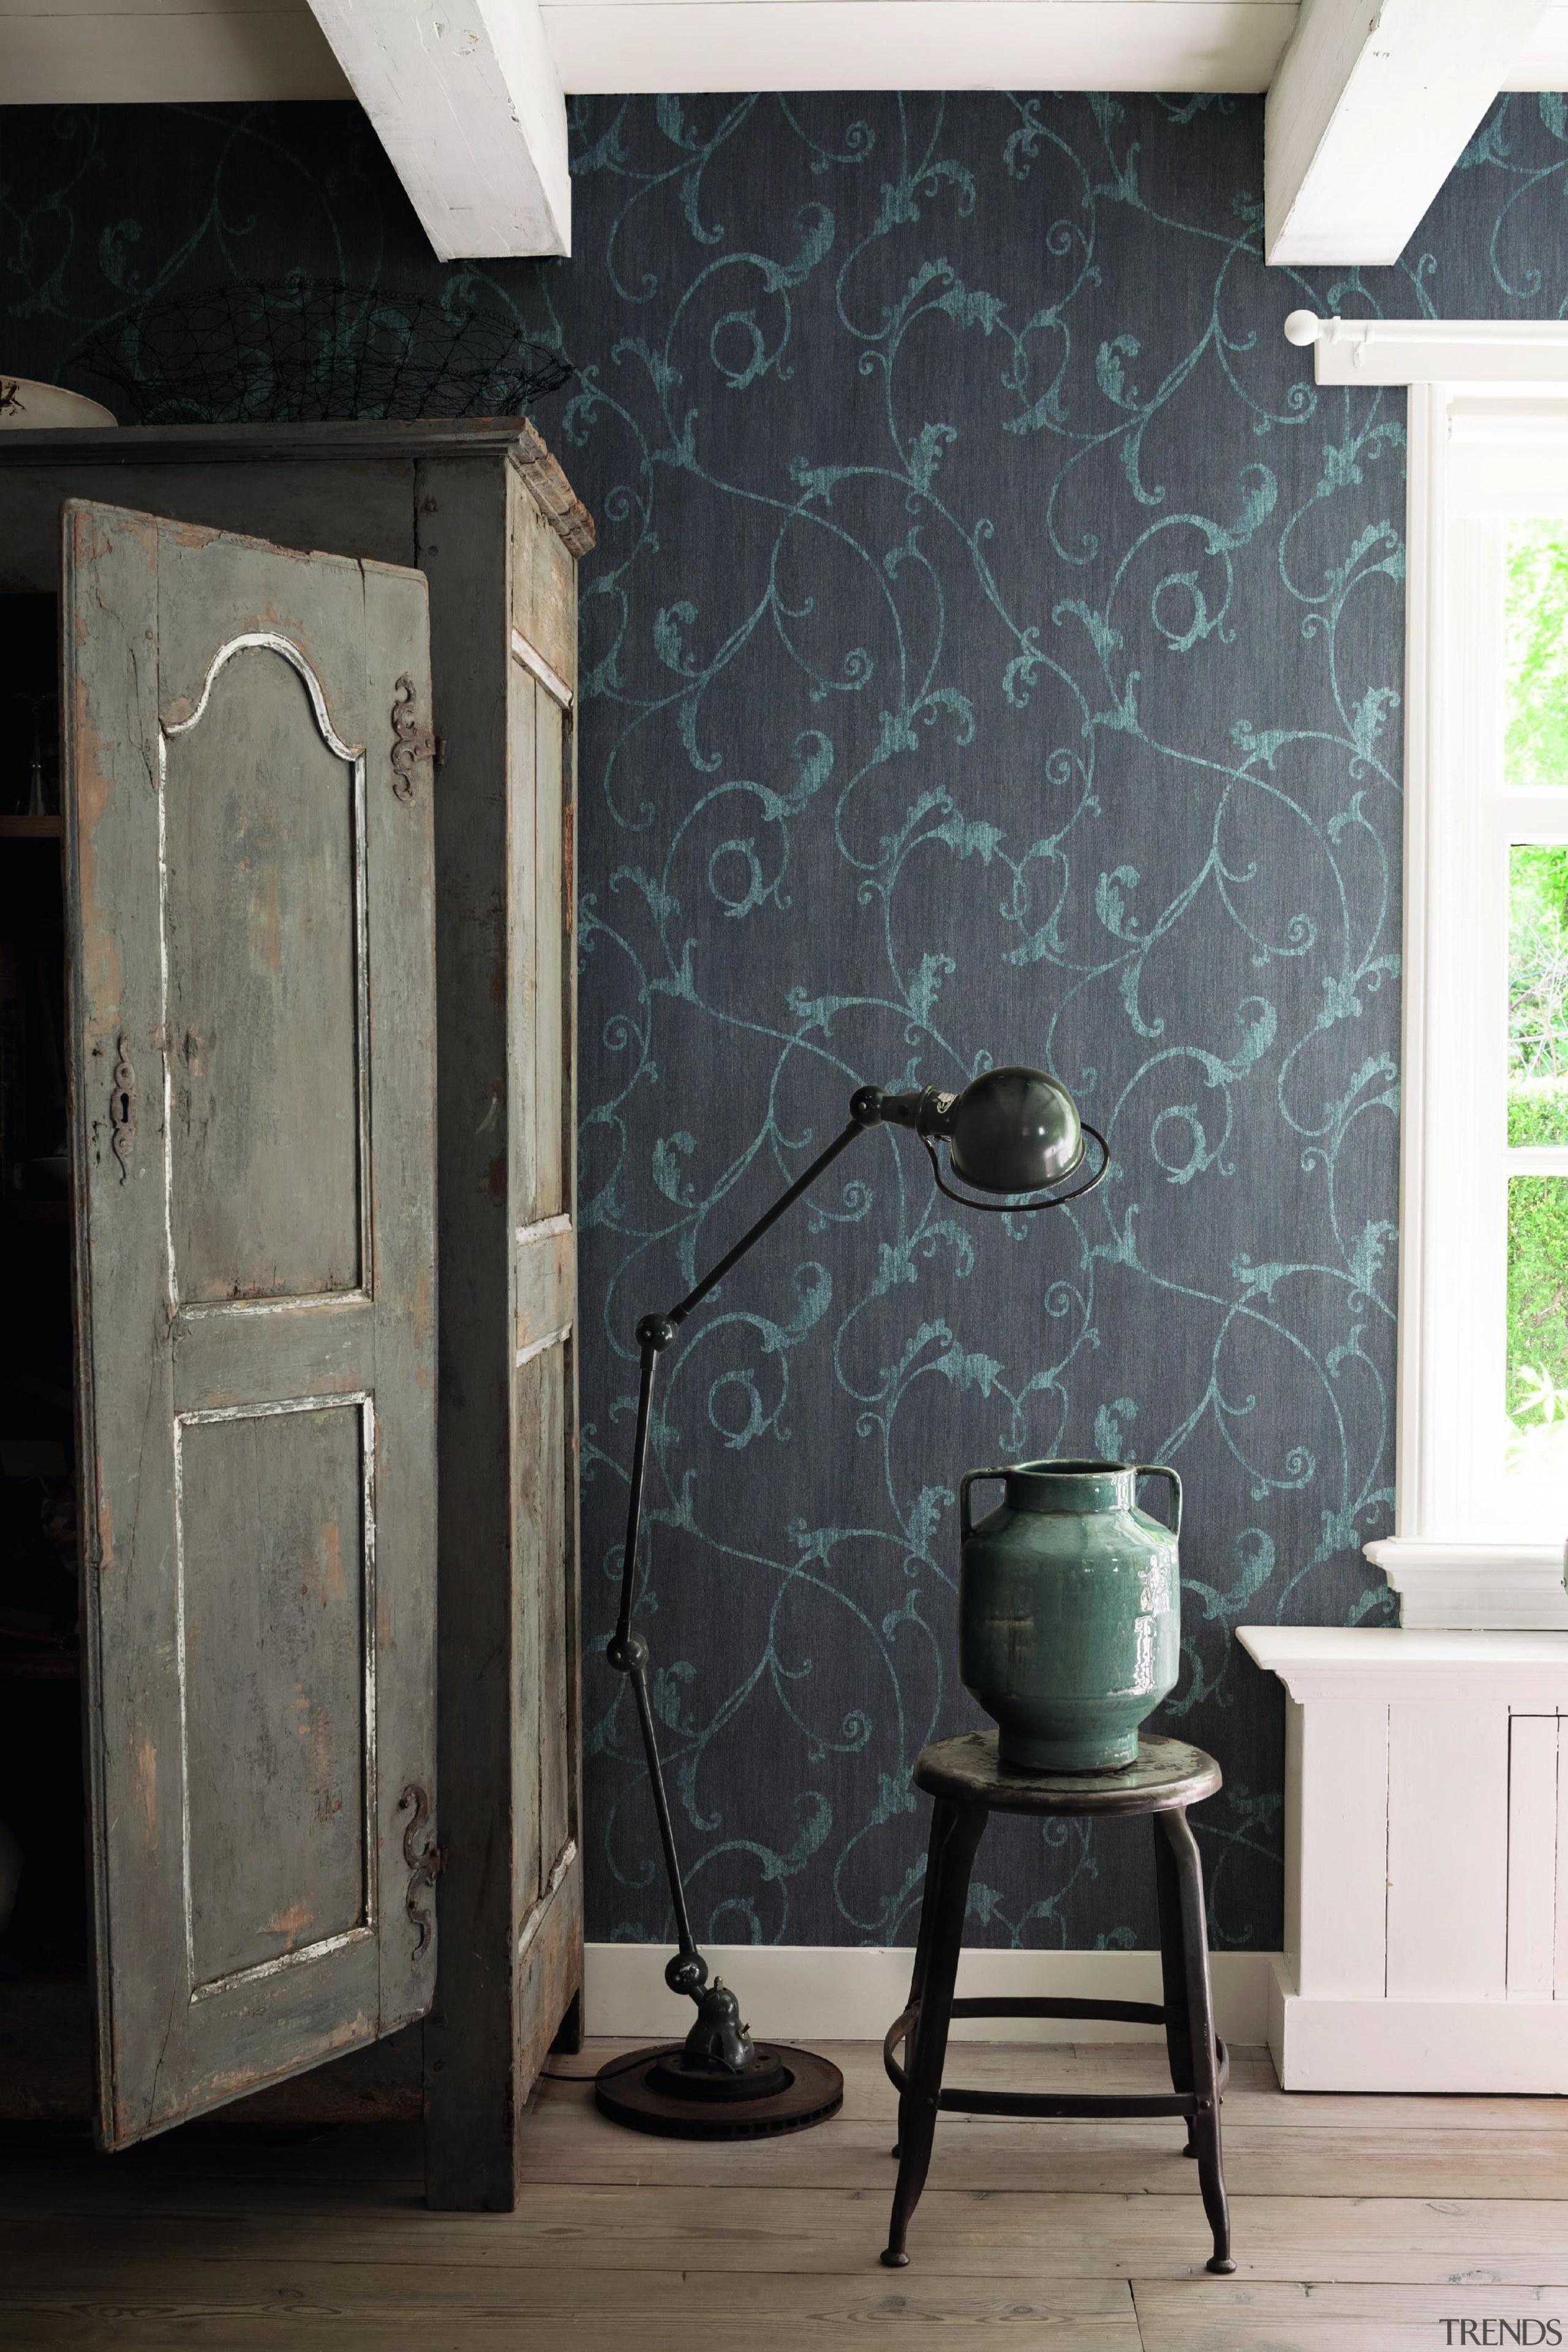 Camarque Range - Camarque Range - chair | chair, door, floor, furniture, home, house, interior design, paint, room, wall, window, black, gray